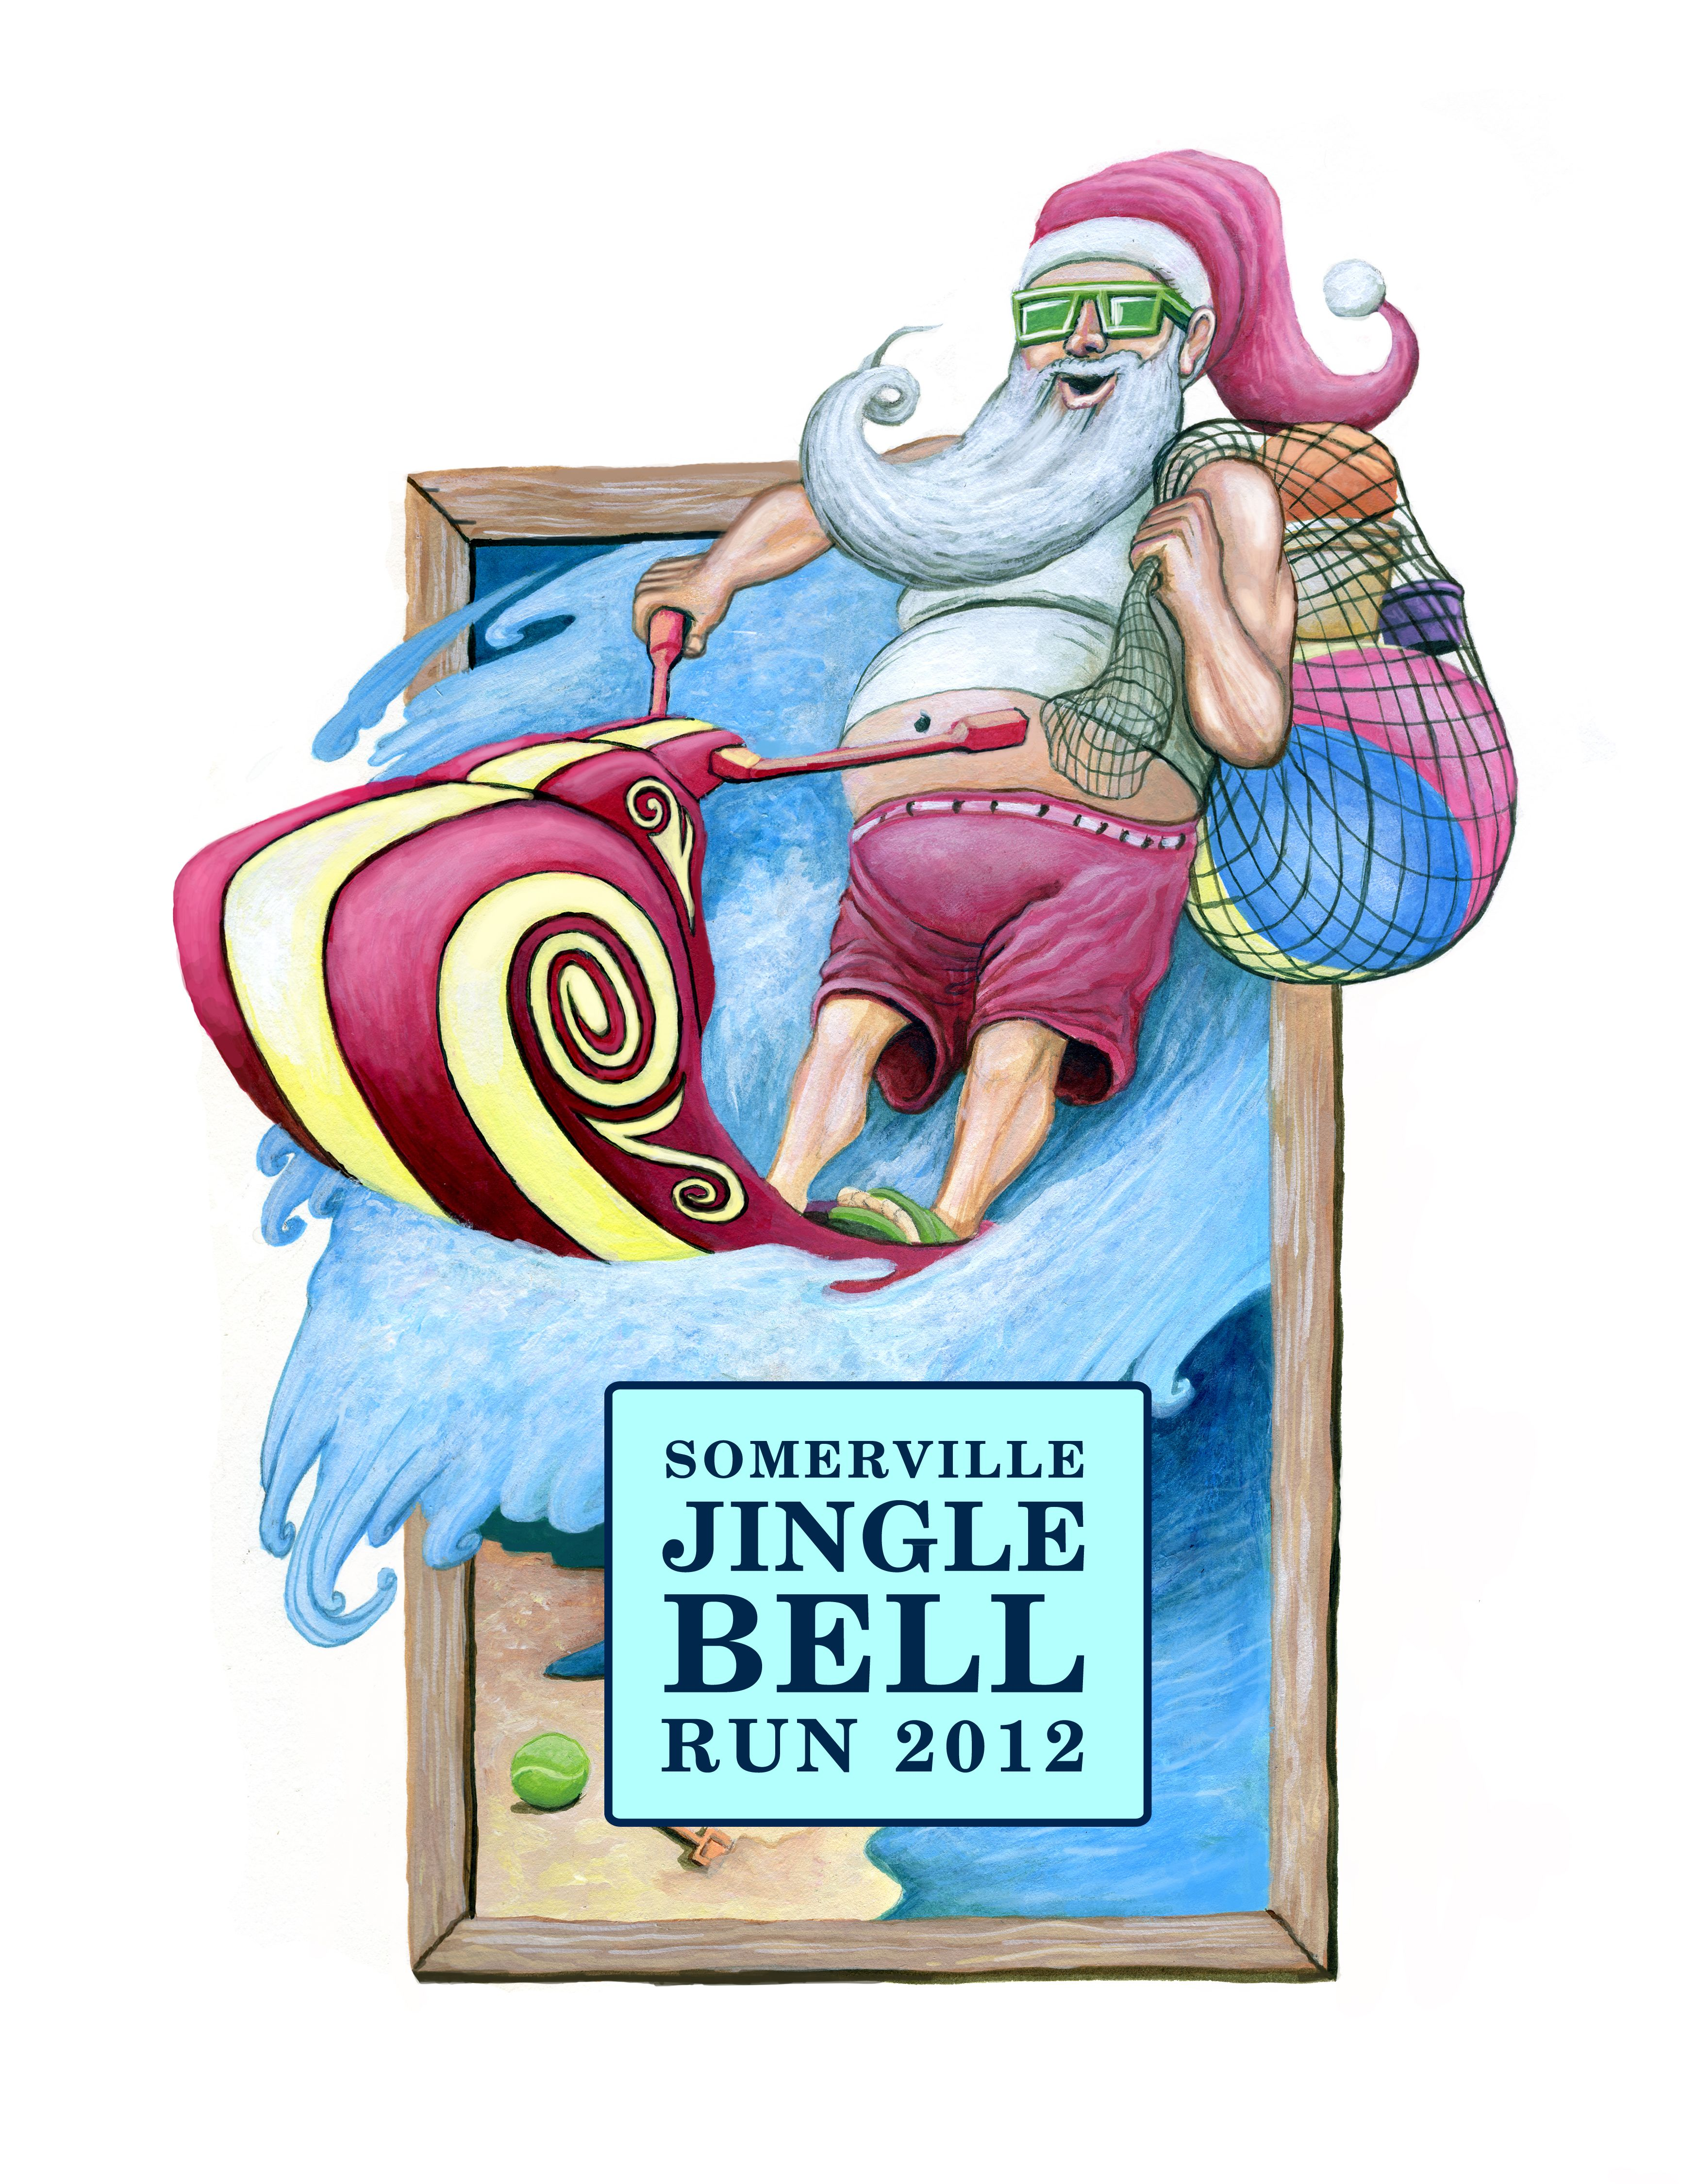 Somerville Jingle Bell Run (2009) Jingle bells, Racing